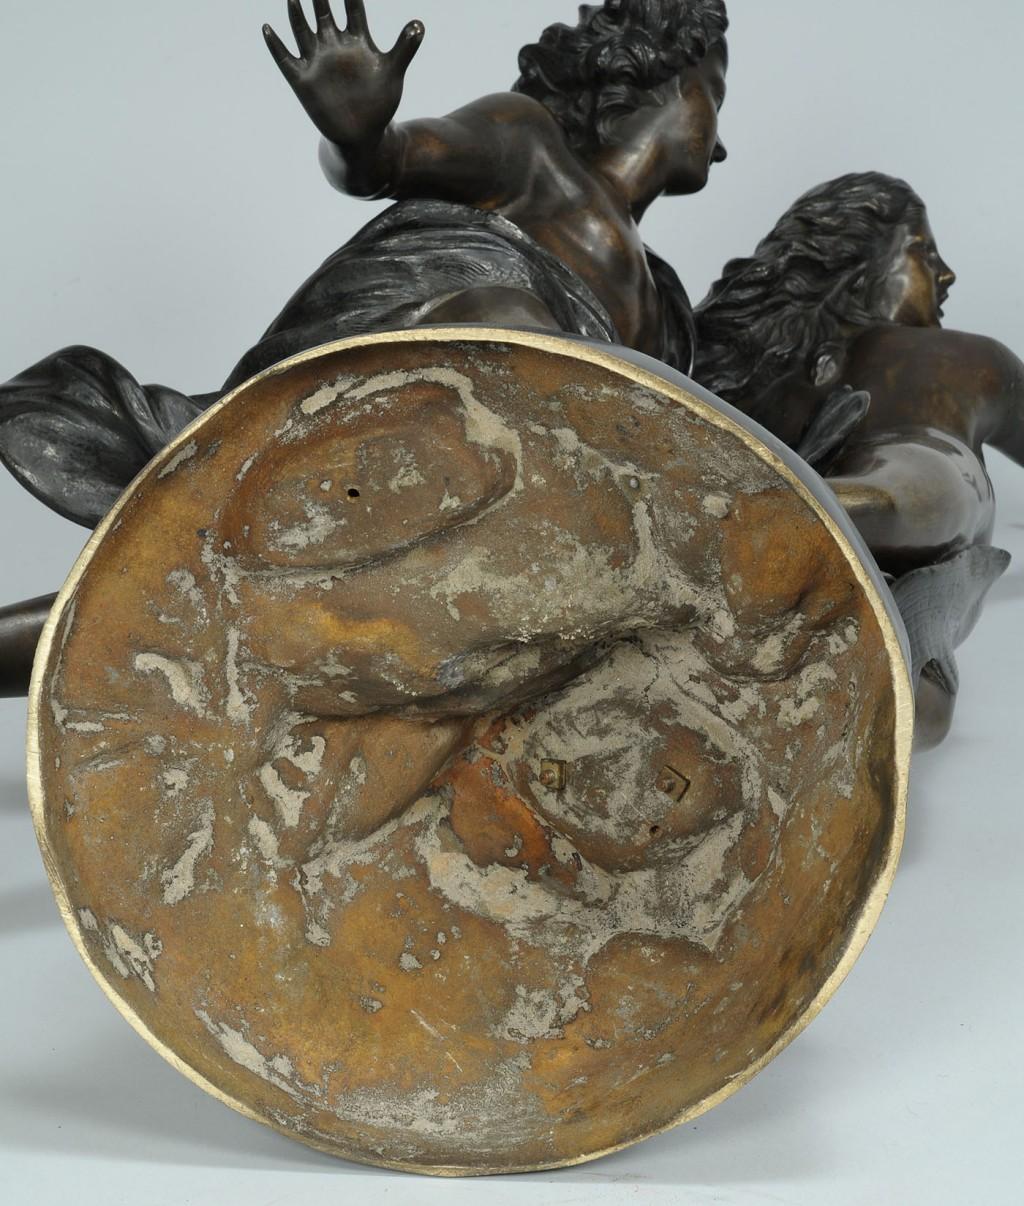 Lot 333: Bronze sculpture of Apollo & Daphne, after Bernini